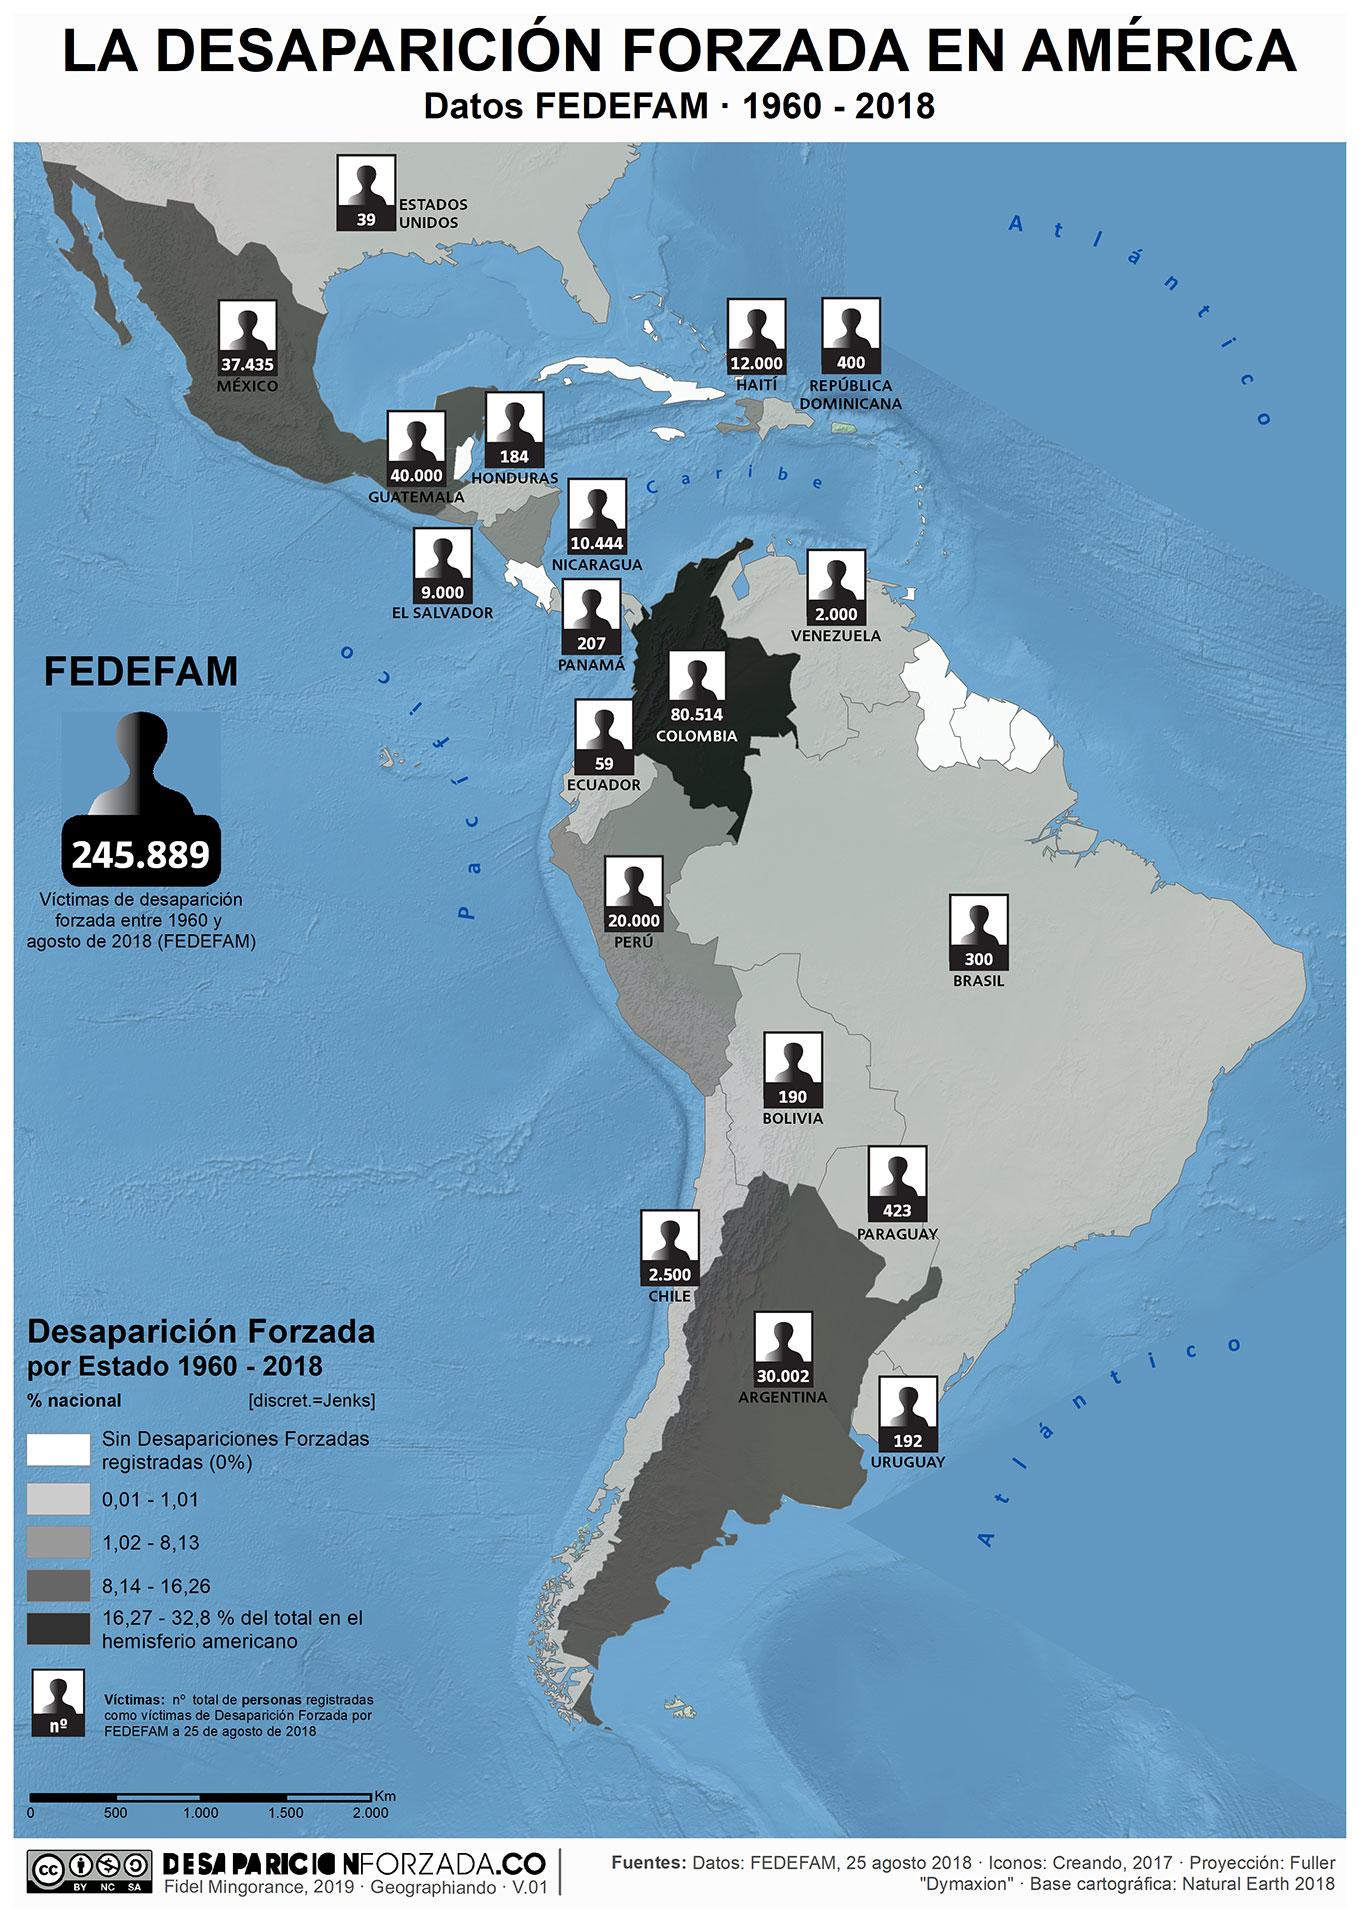 mapa desaparicion forzada america datos fedefam agosto 2018